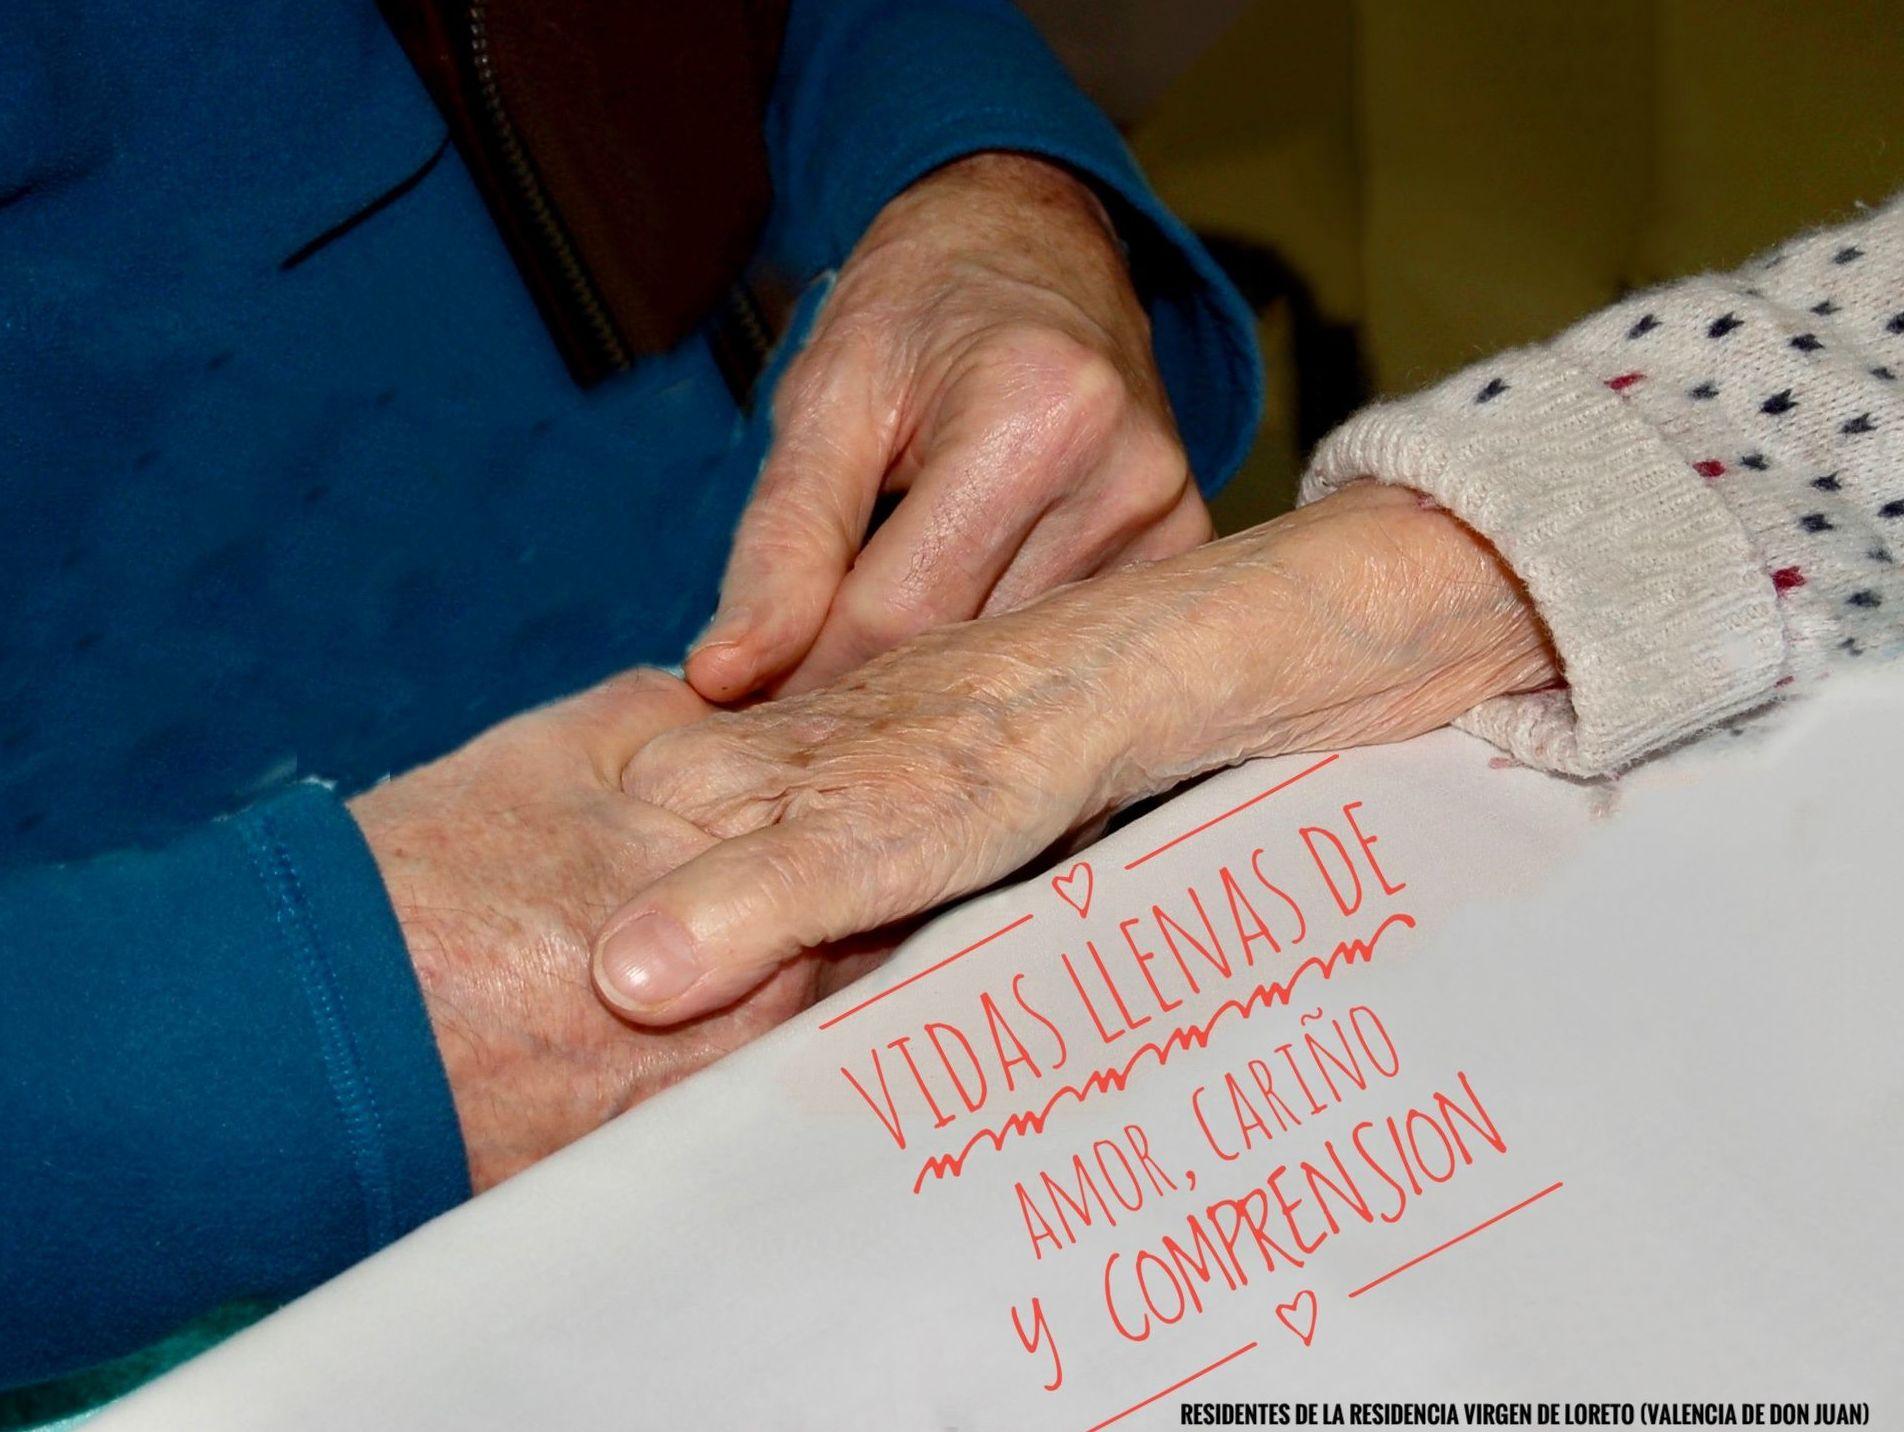 Foto 3 de Residencia de ancianos en Valencia de Don Juan | Residencia Virgen de Loreto